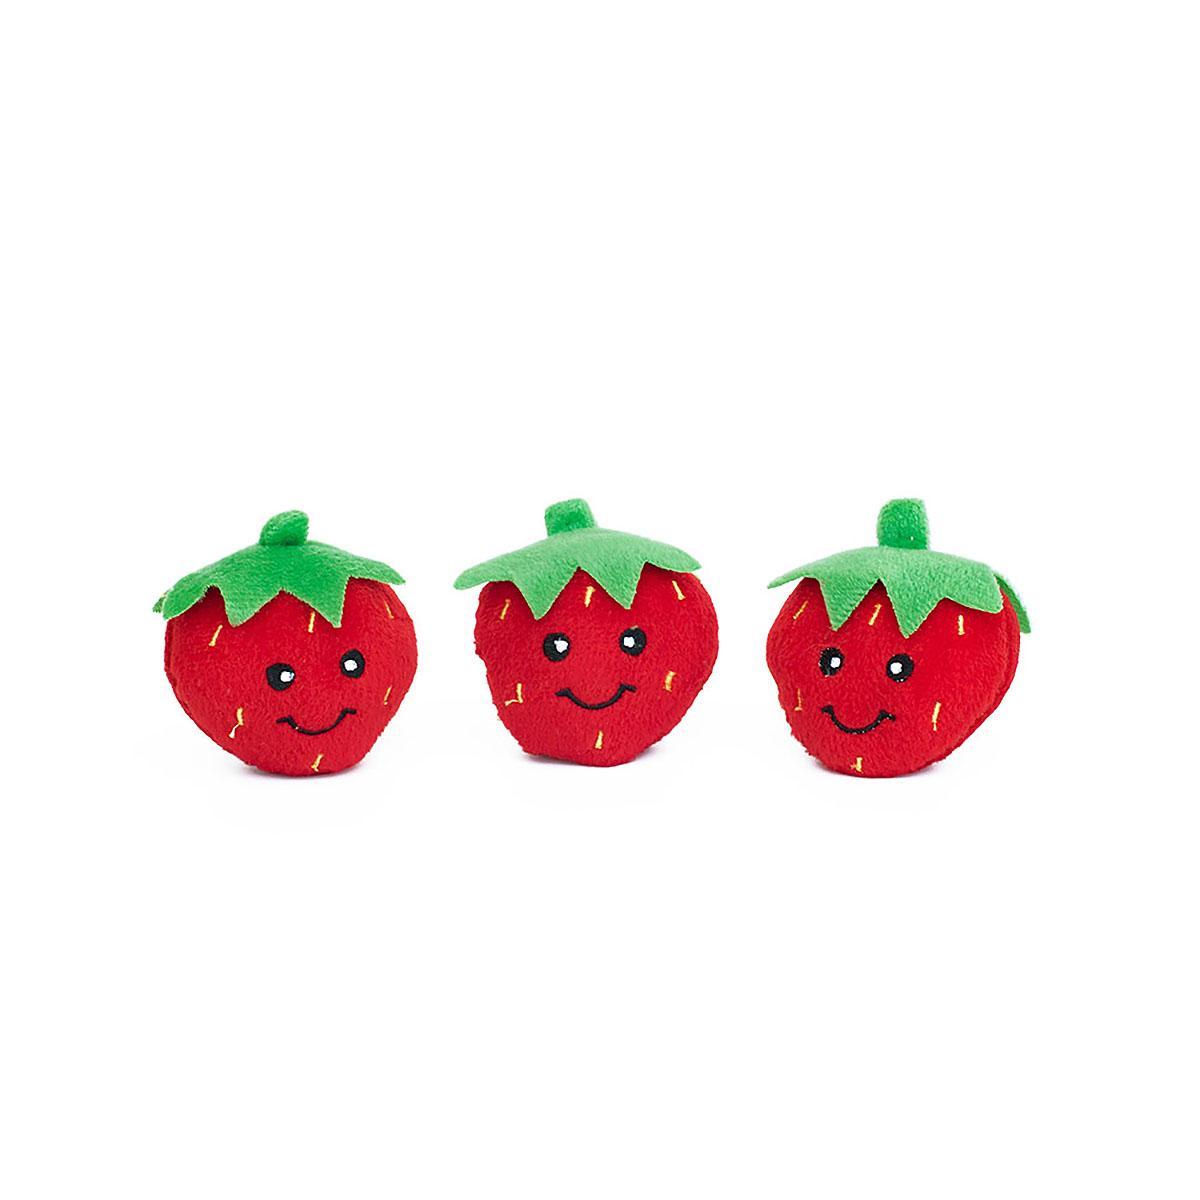 ZippyPaws Miniz Dog Toys - Strawberries